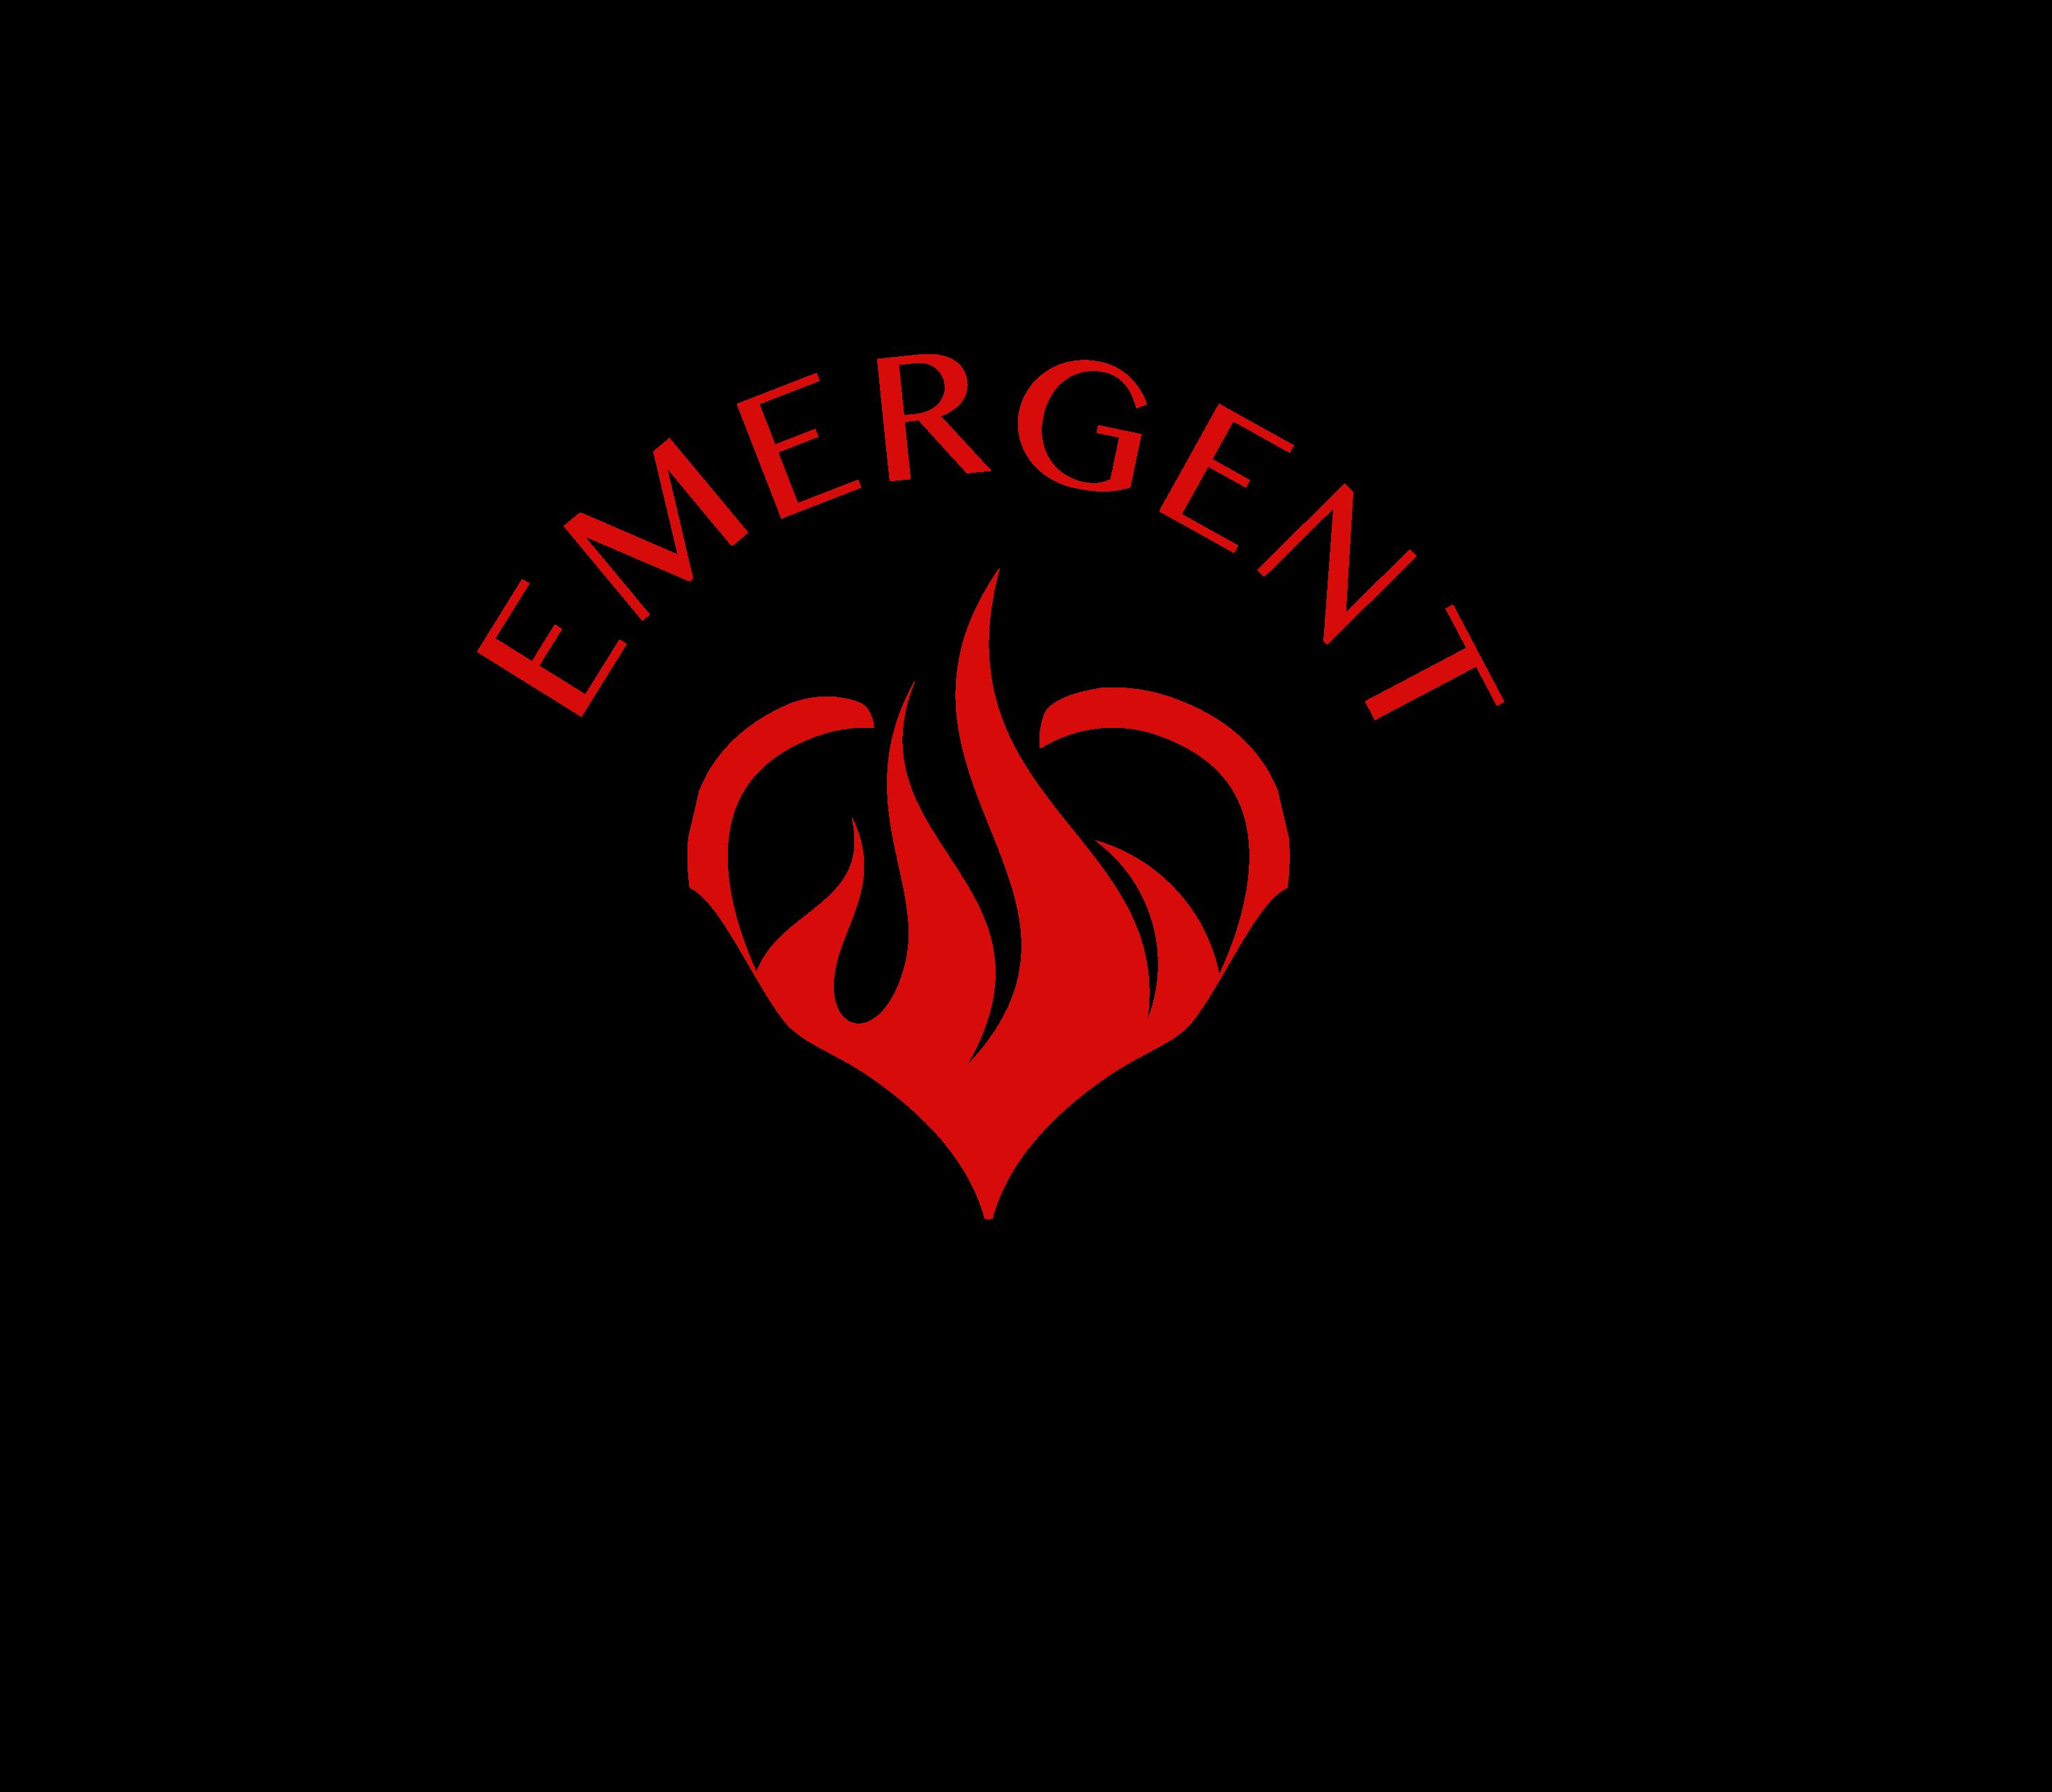 DARE TO EMERGE!